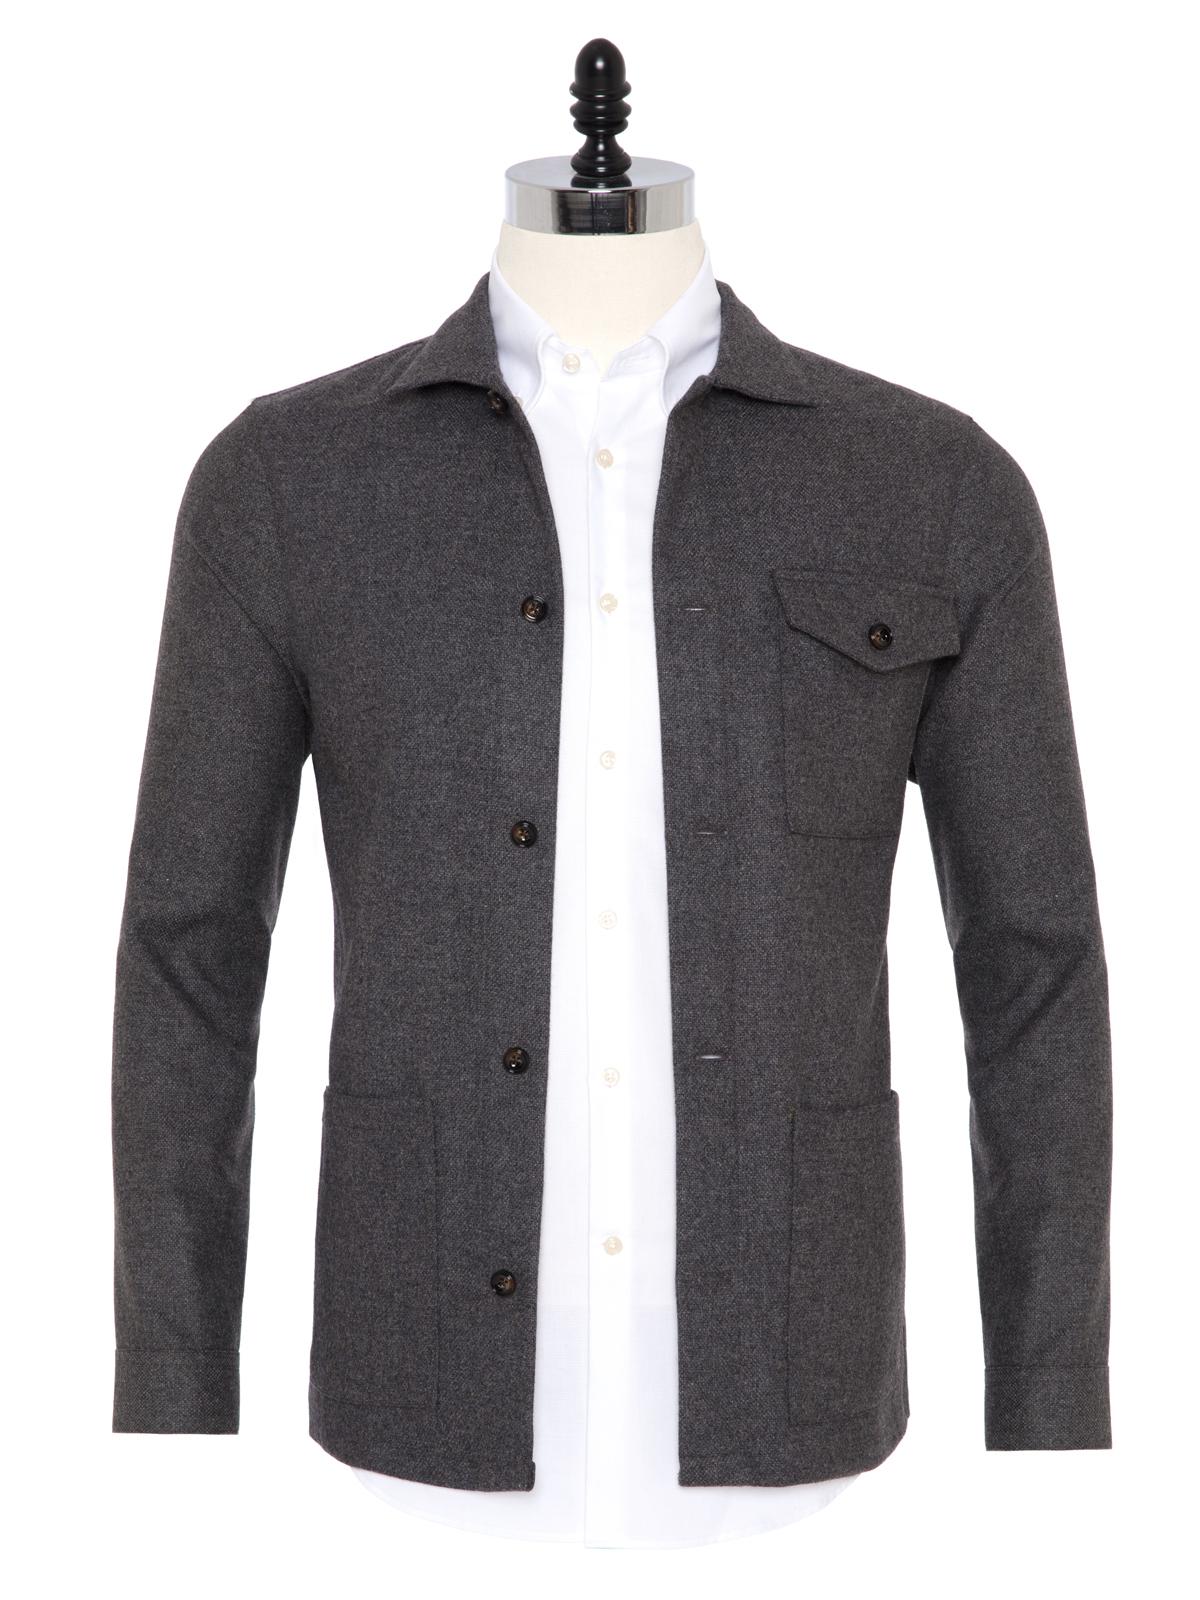 Germirli - Germirli Gri %100 Yün Tailor Fit Wool Heritage Ceket Gömlek